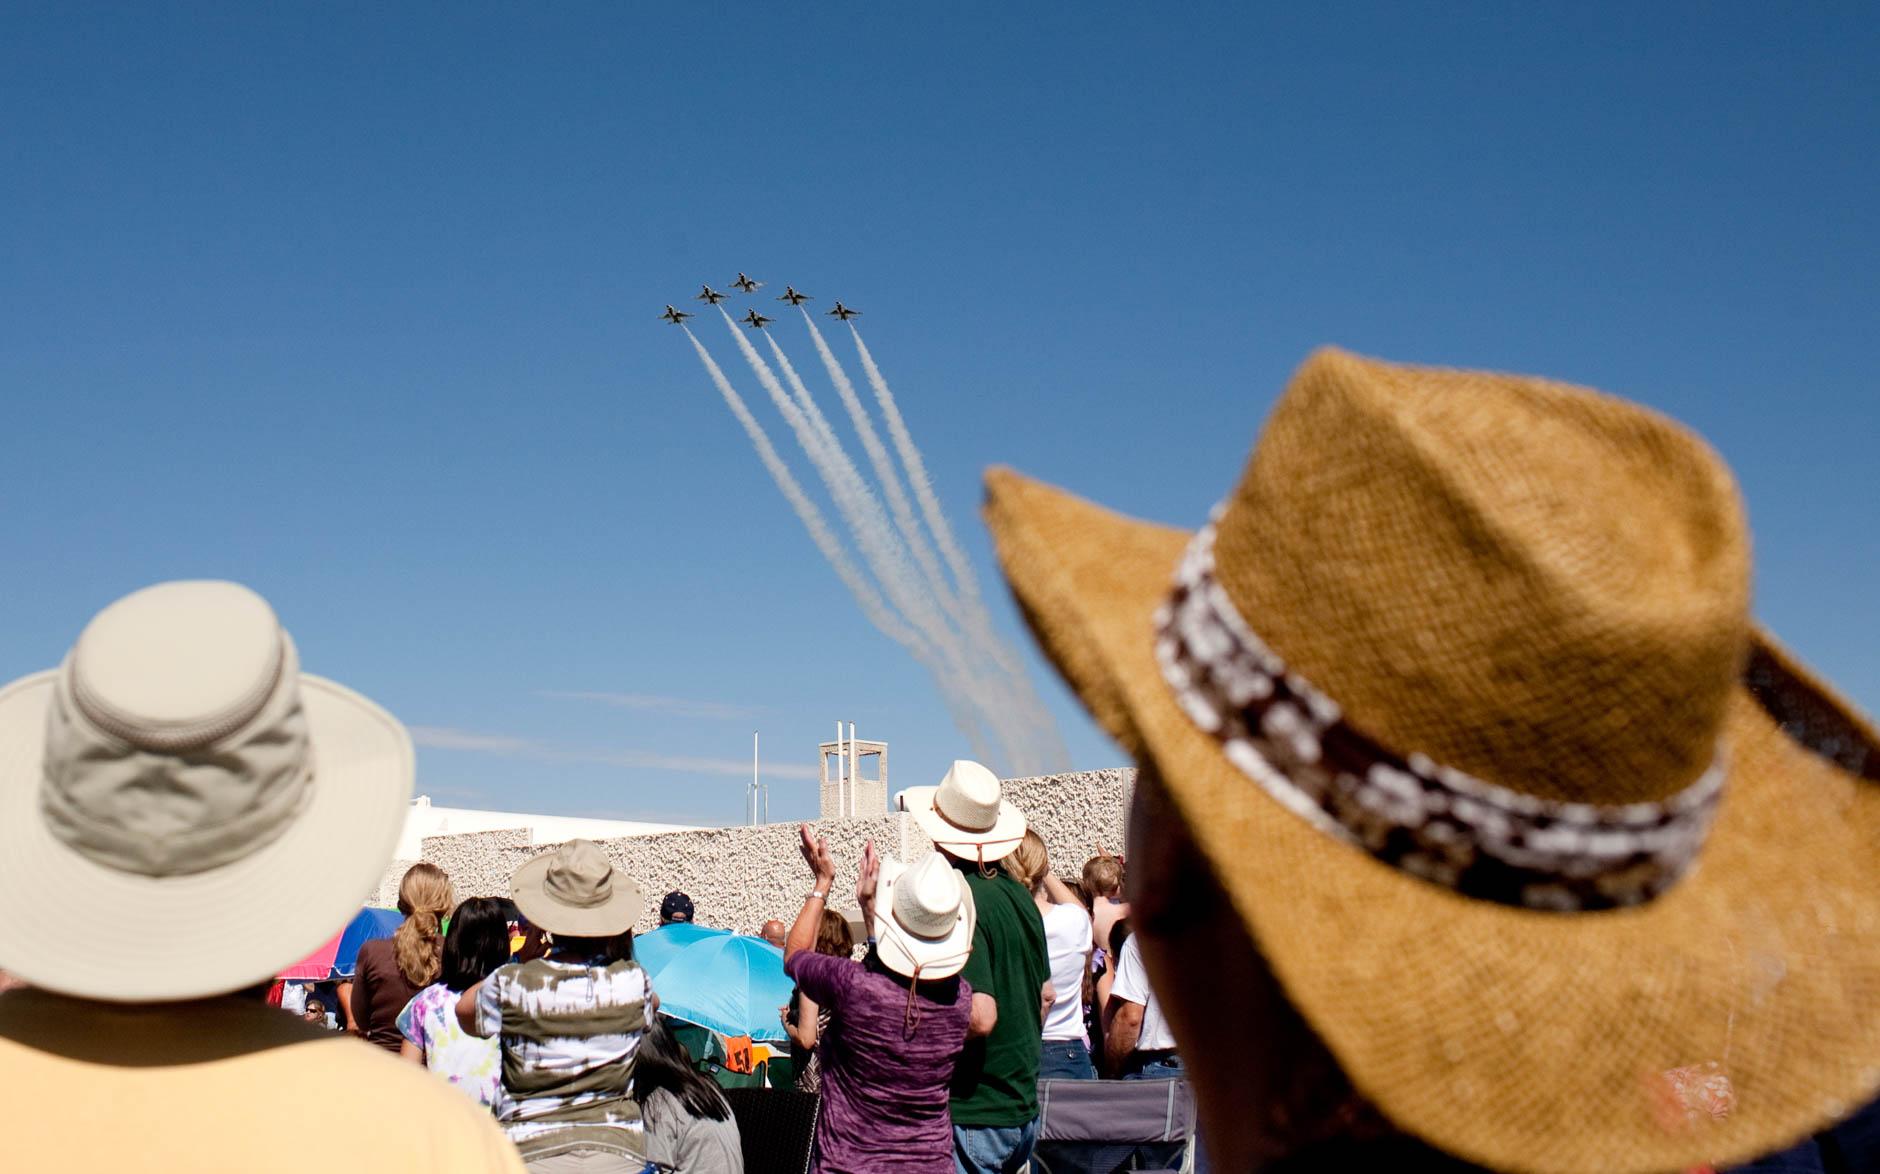 Cheyenne Frontier Days U.S. Air Force Thunderbirds